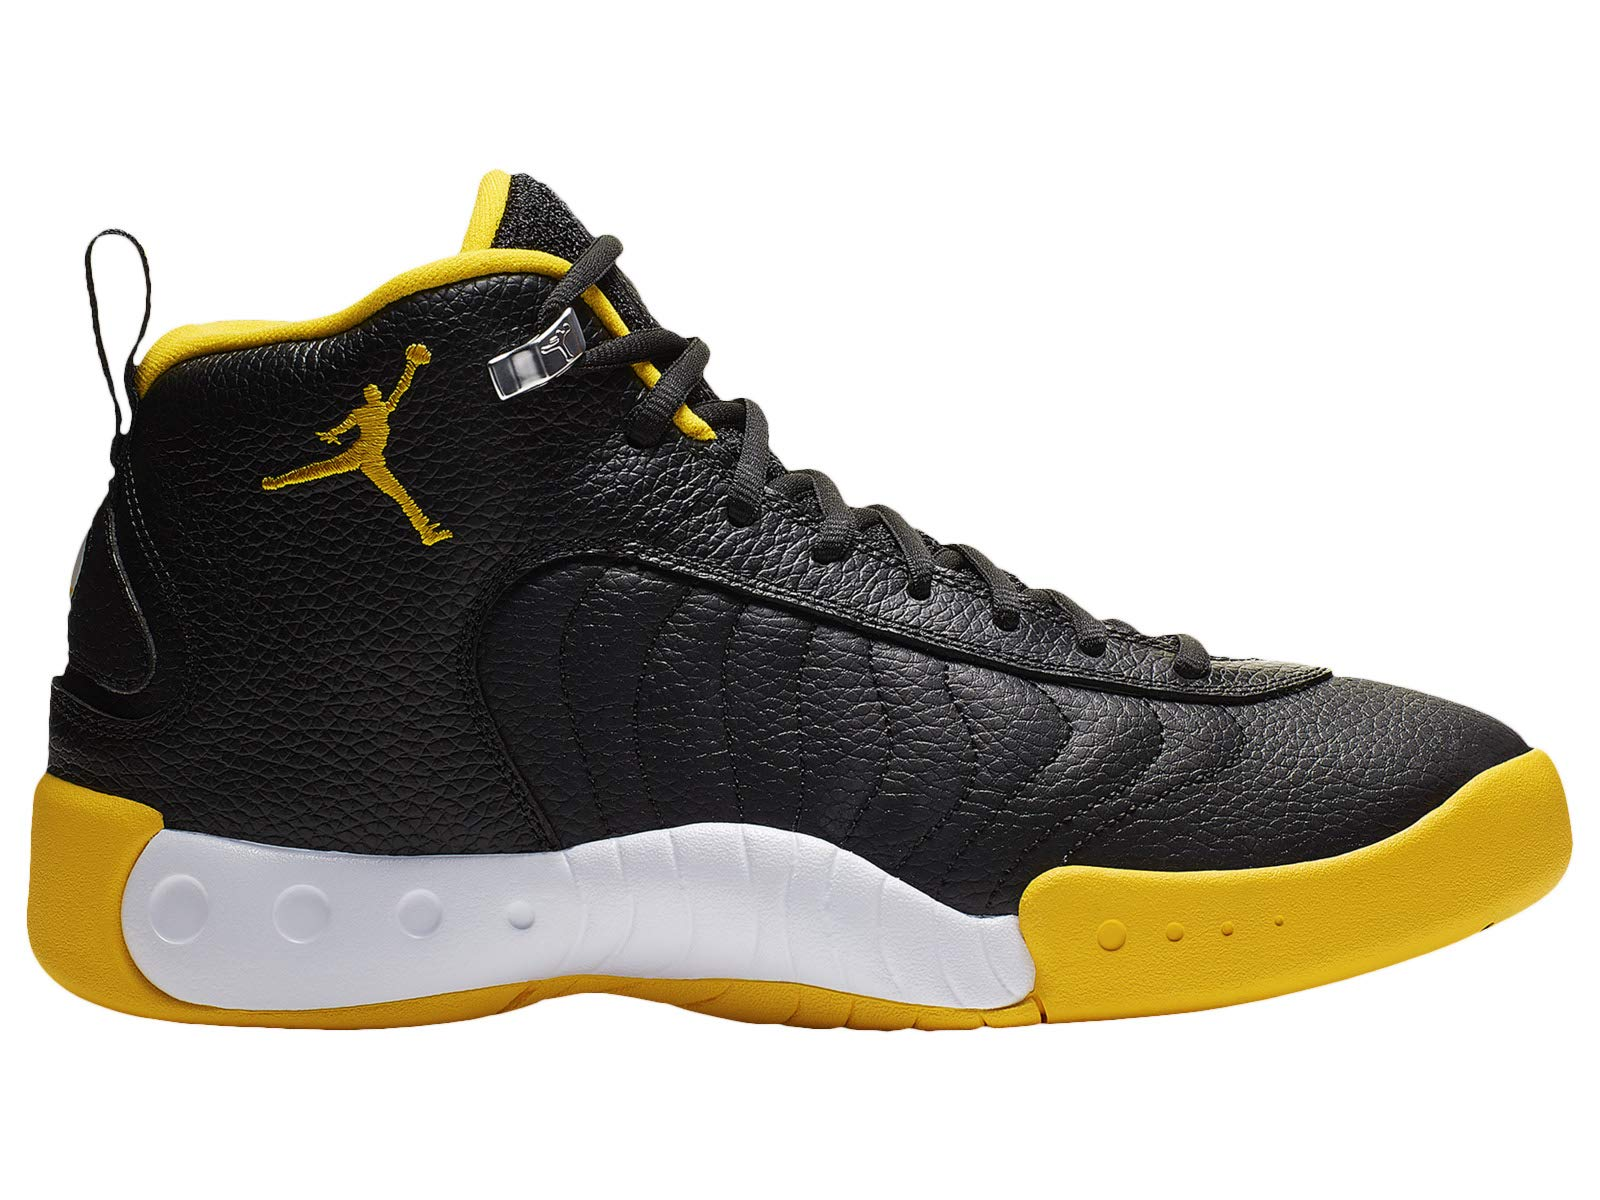 Nike Men's Jordan Jumpman Pro Black/University Gold/White Leather Basketball Shoes 12 M US by Nike